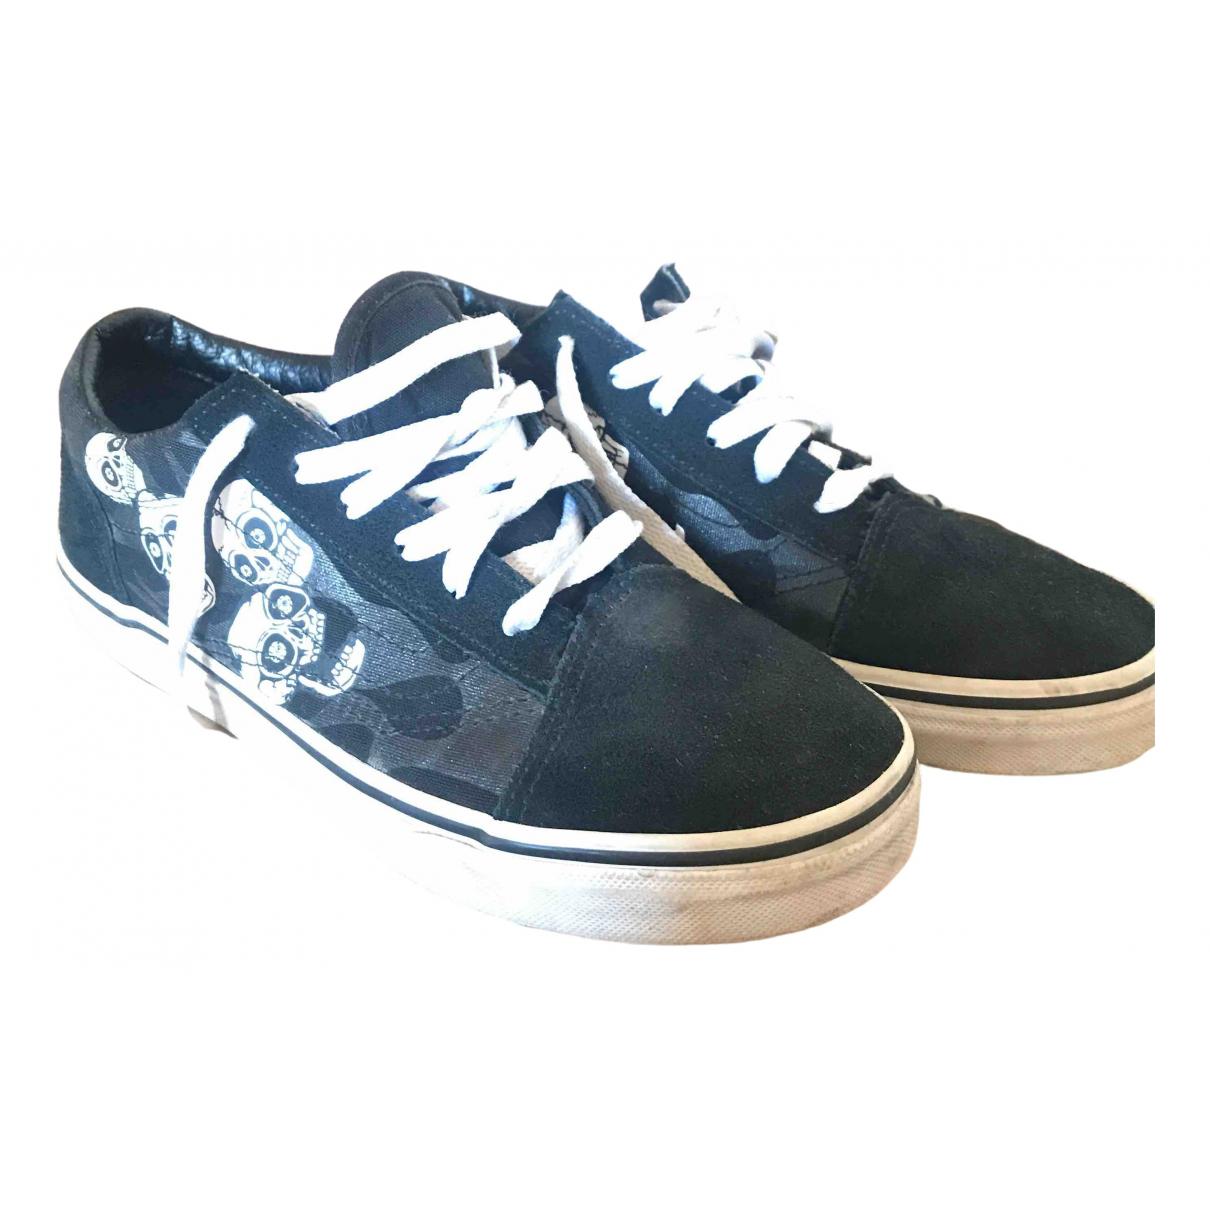 Vans \N Black Suede Lace up boots for Kids 4.5 UK